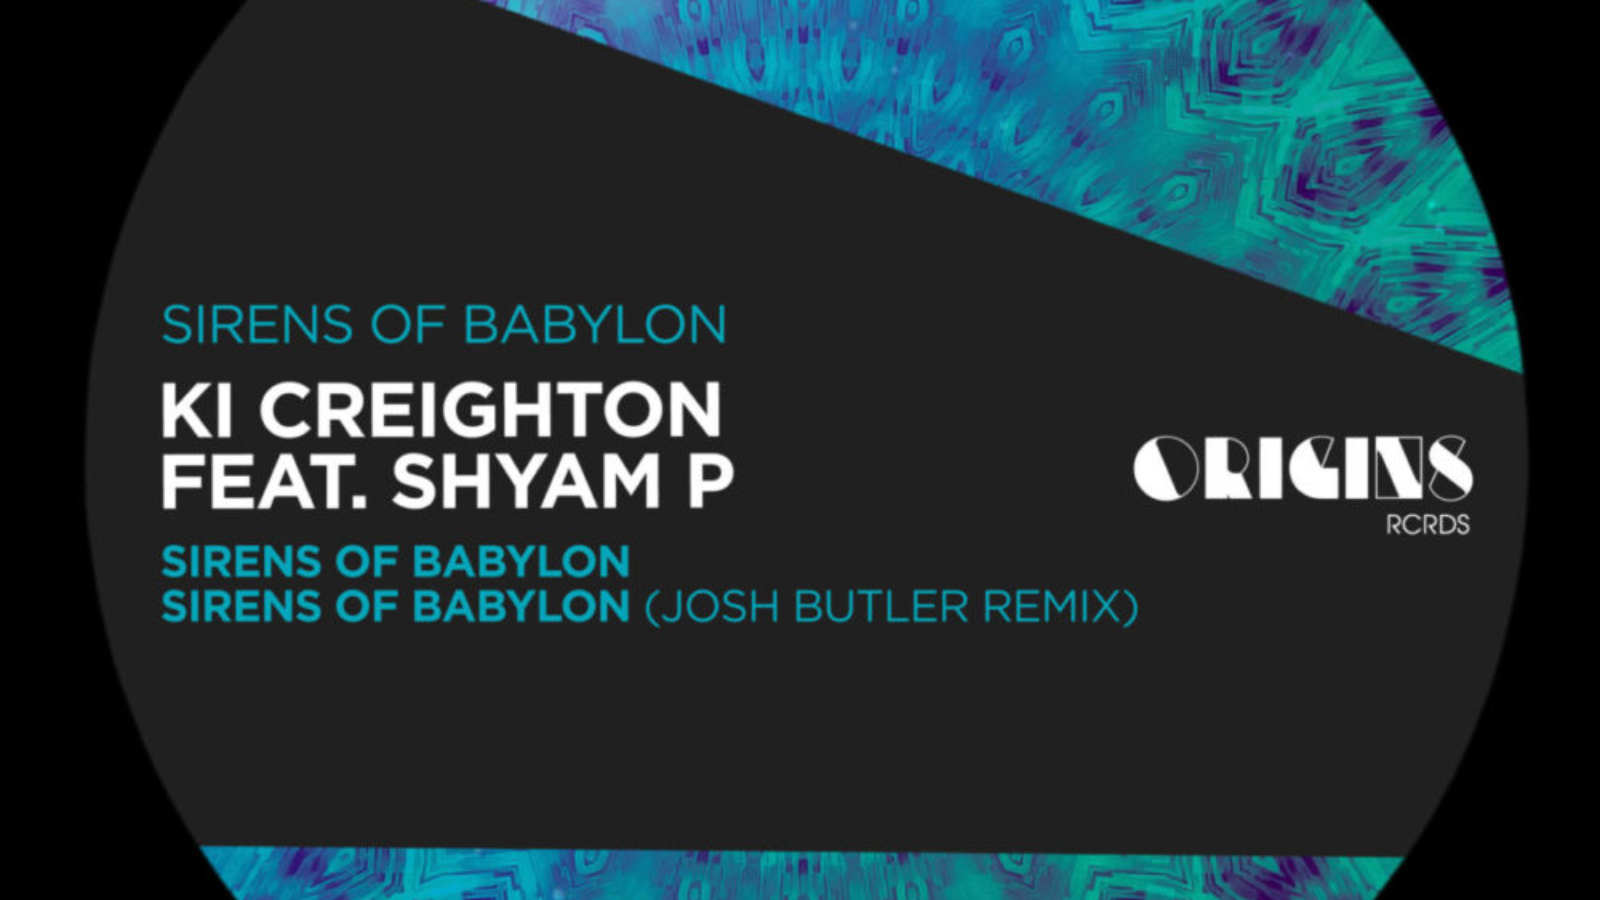 ORIGINS025 COVER Ki Creighton feat. Shyam P - Sirens Of Babylon - ORIGINS RCRDS